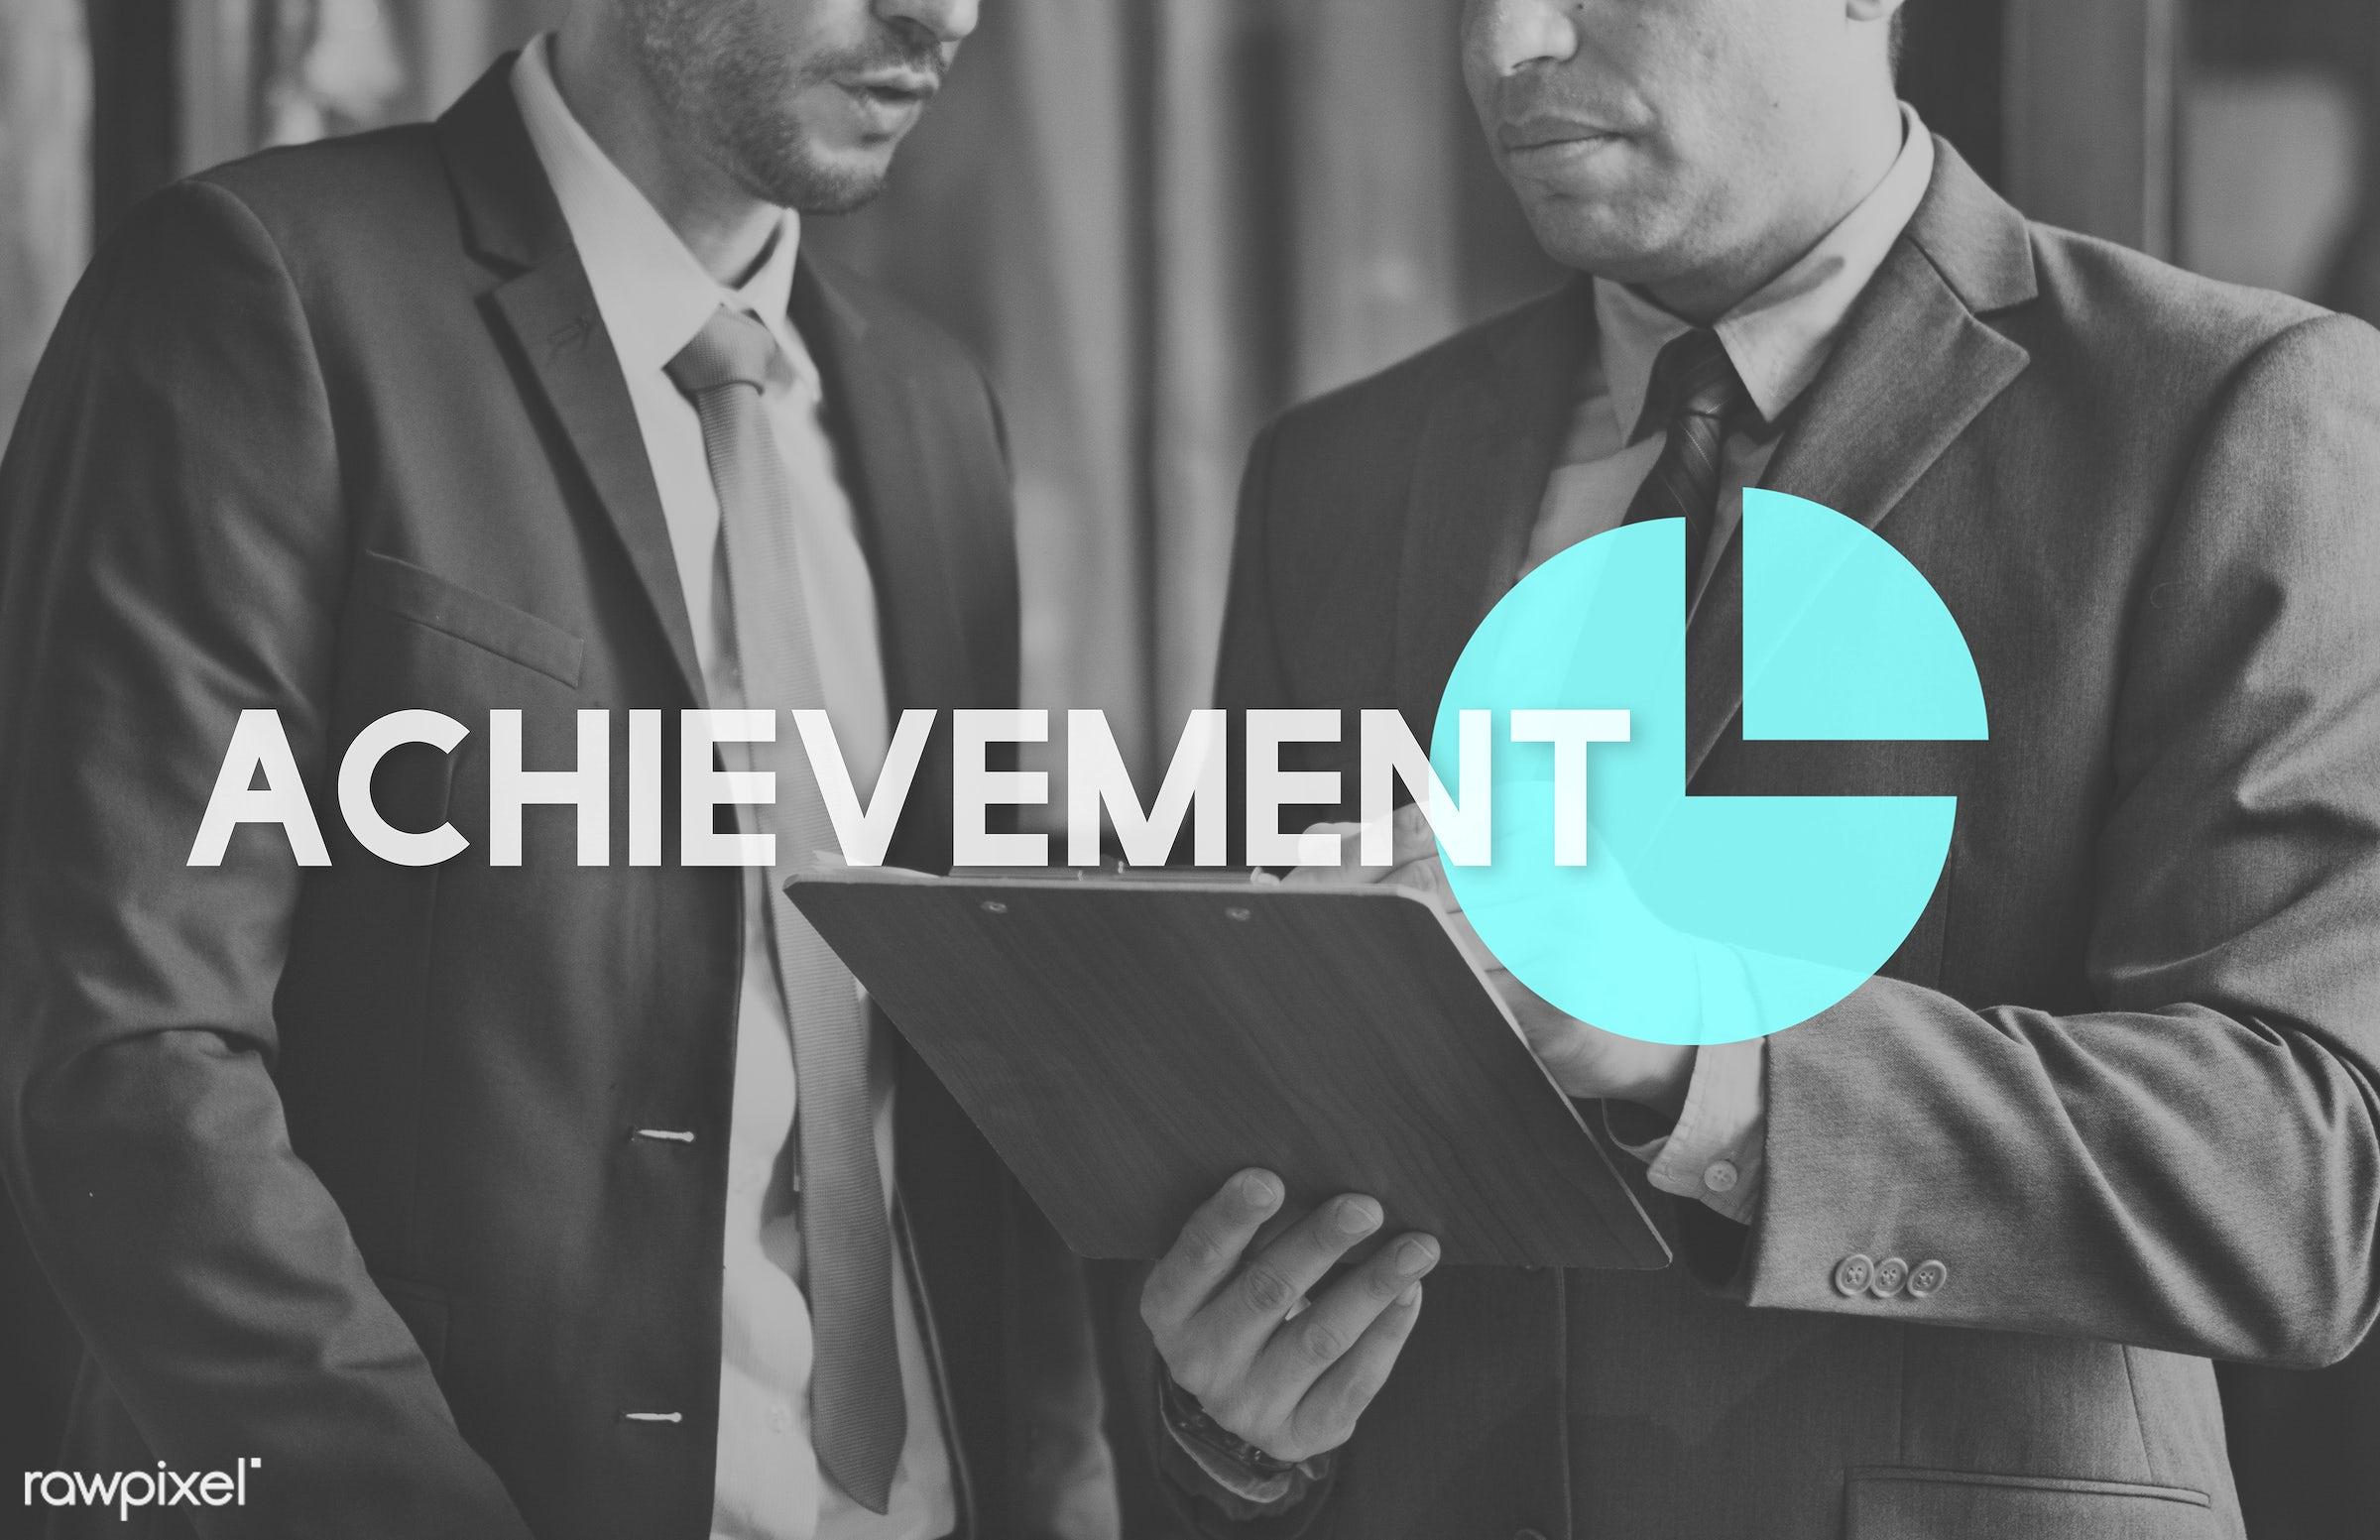 achievement, board, business, businessman, businessmen, caucasian, chart, conversation, corporation, development,...